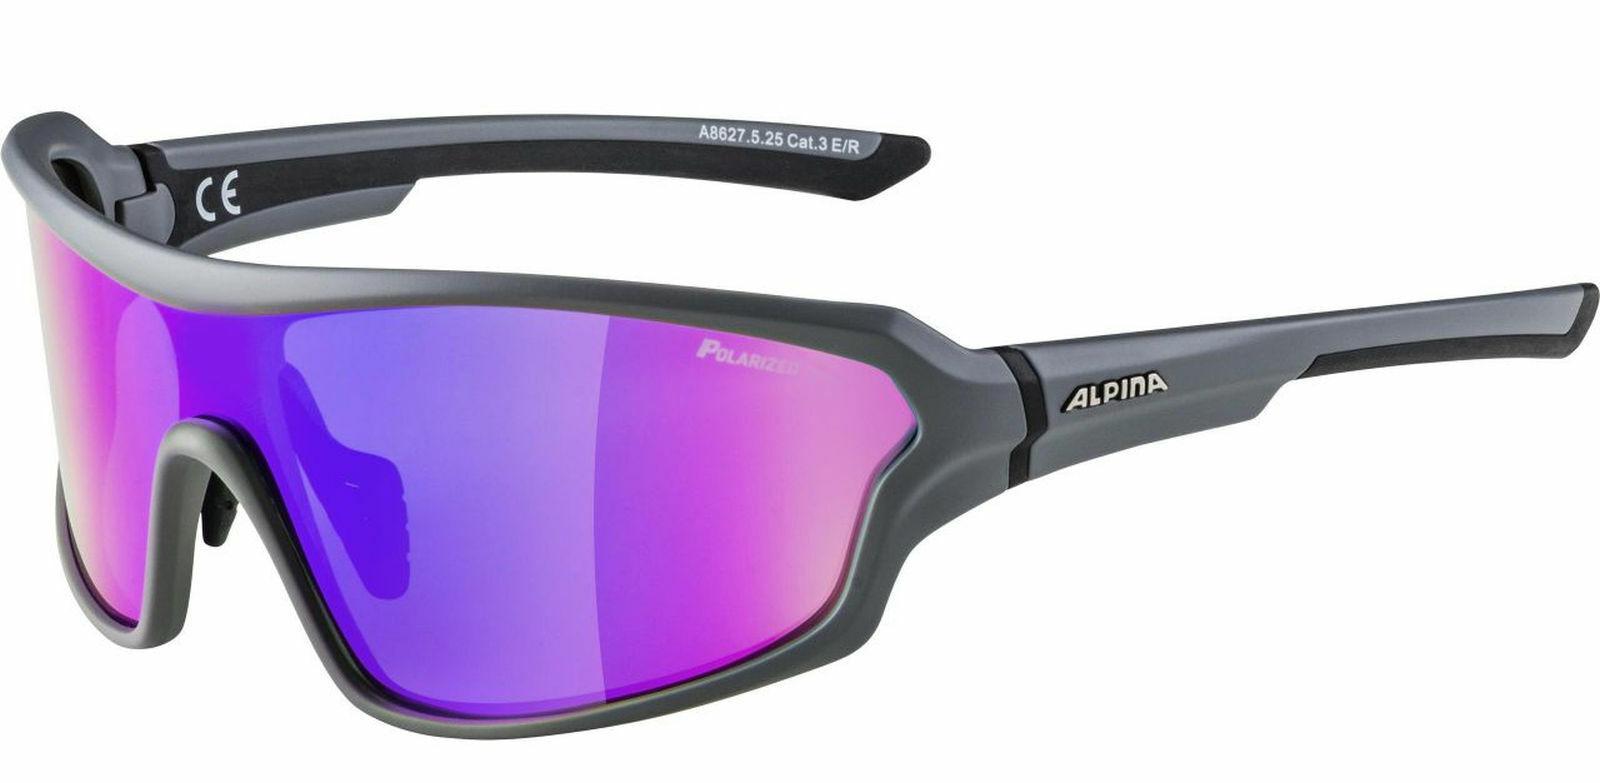 Alpina sunglasses sports  cycling polarized disk lyron shield p grey  online cheap